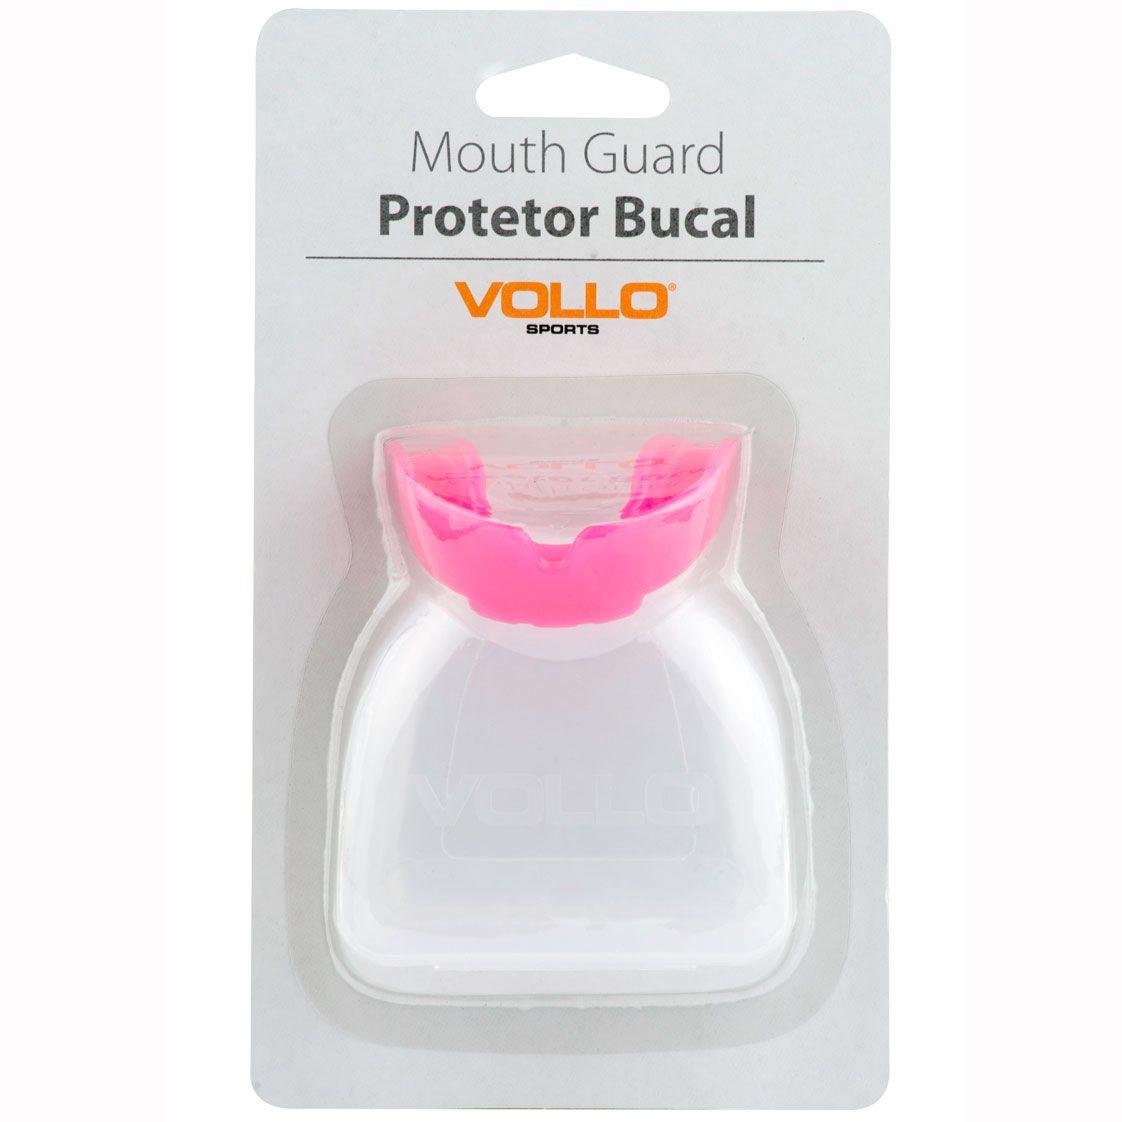 Protetor Bucal Vollo com estojo (rosa)